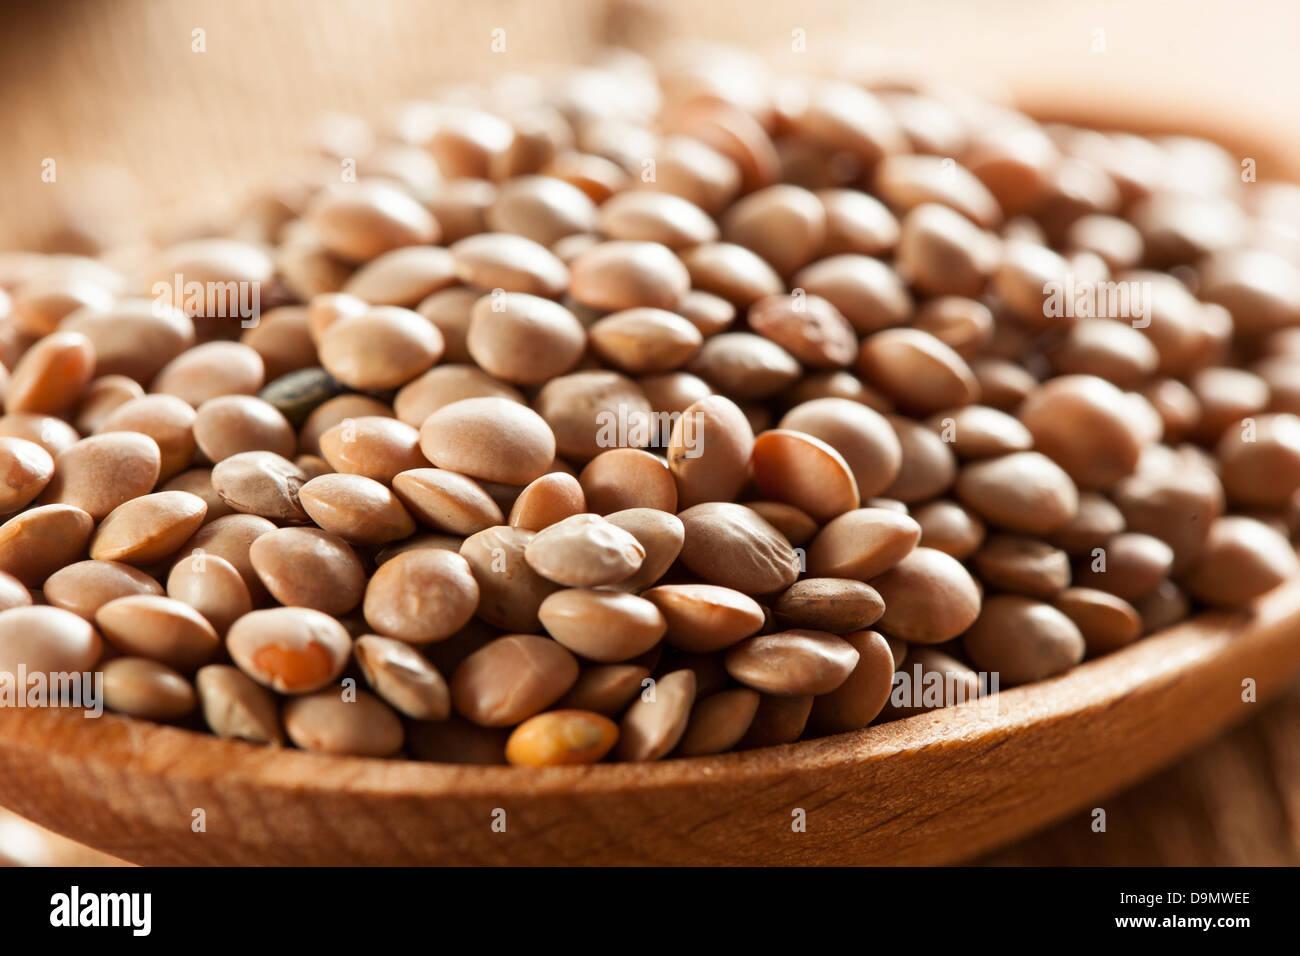 Brown orgánicos secos lentejas contra un fondo Imagen De Stock